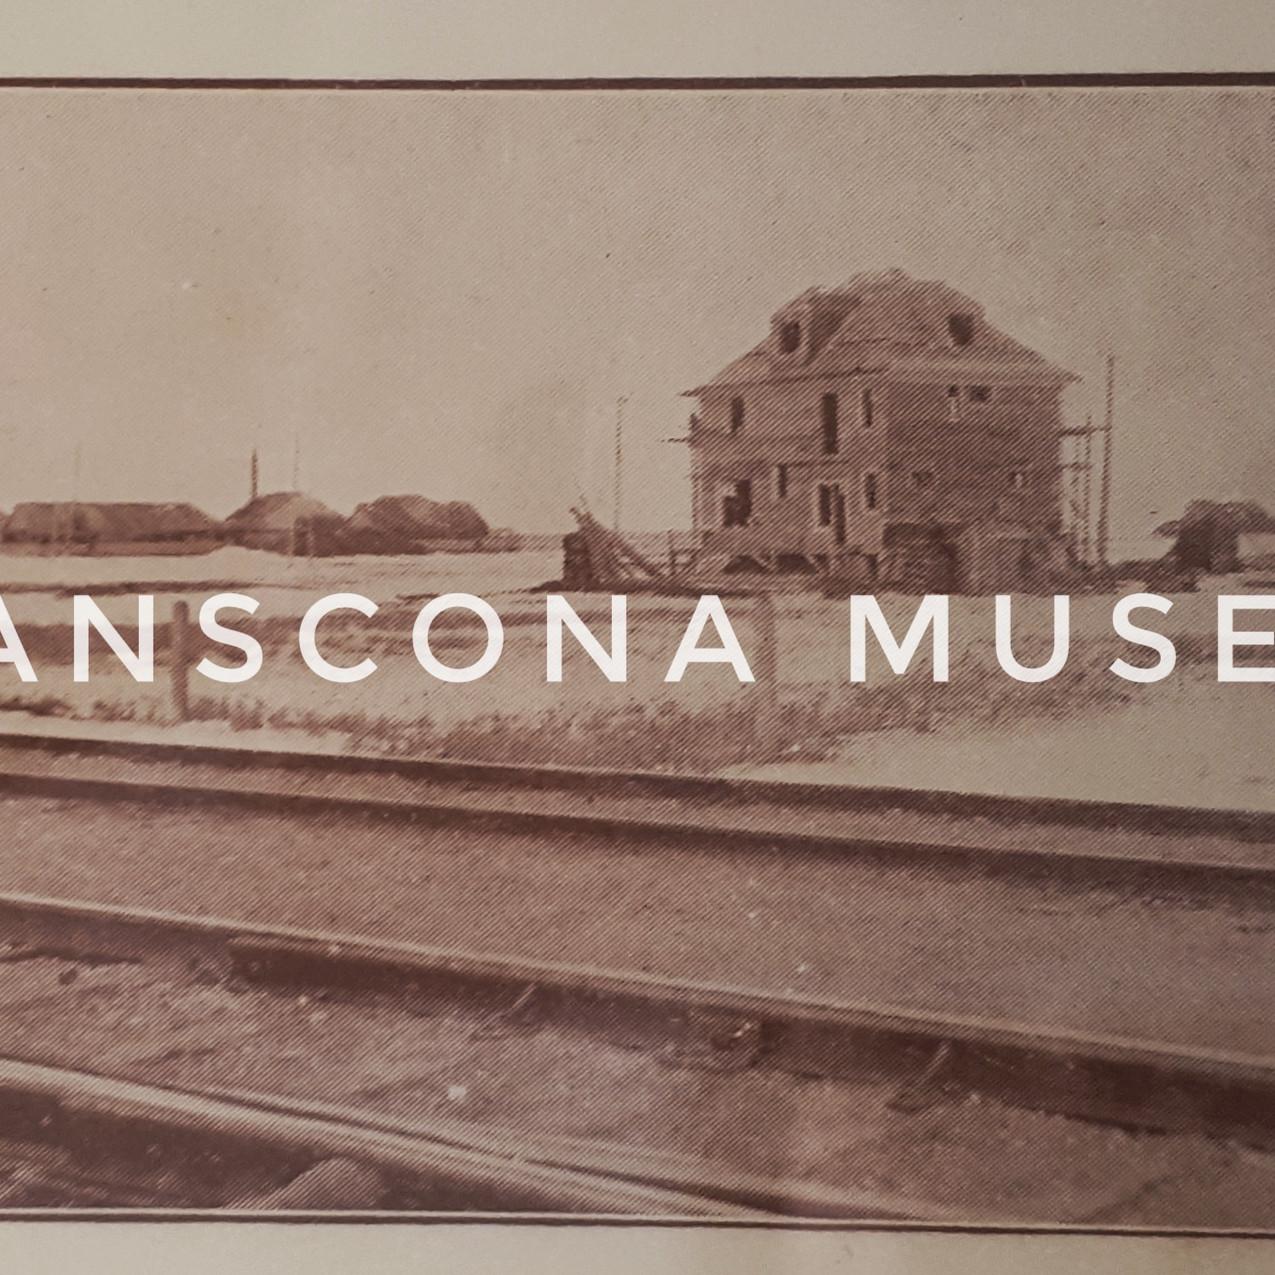 A new building in North Transcona, ca. 1912